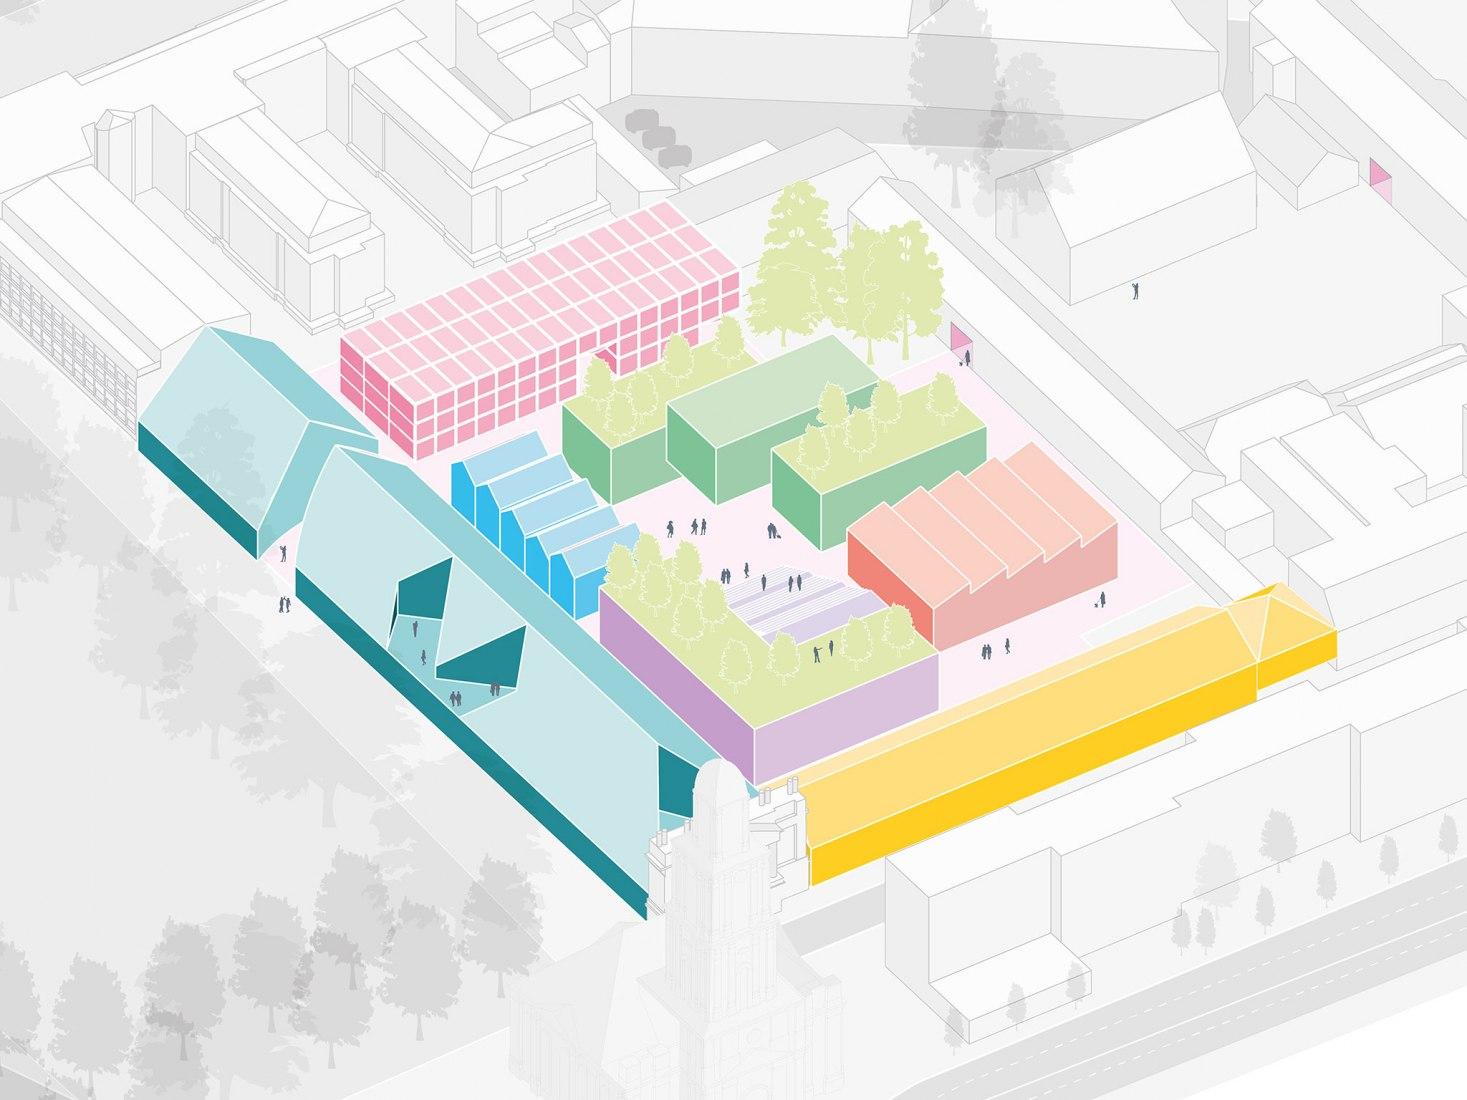 Axonometric view. New Creative Quarter Potsdam by MVRDV. Image courtesy of MVRDV